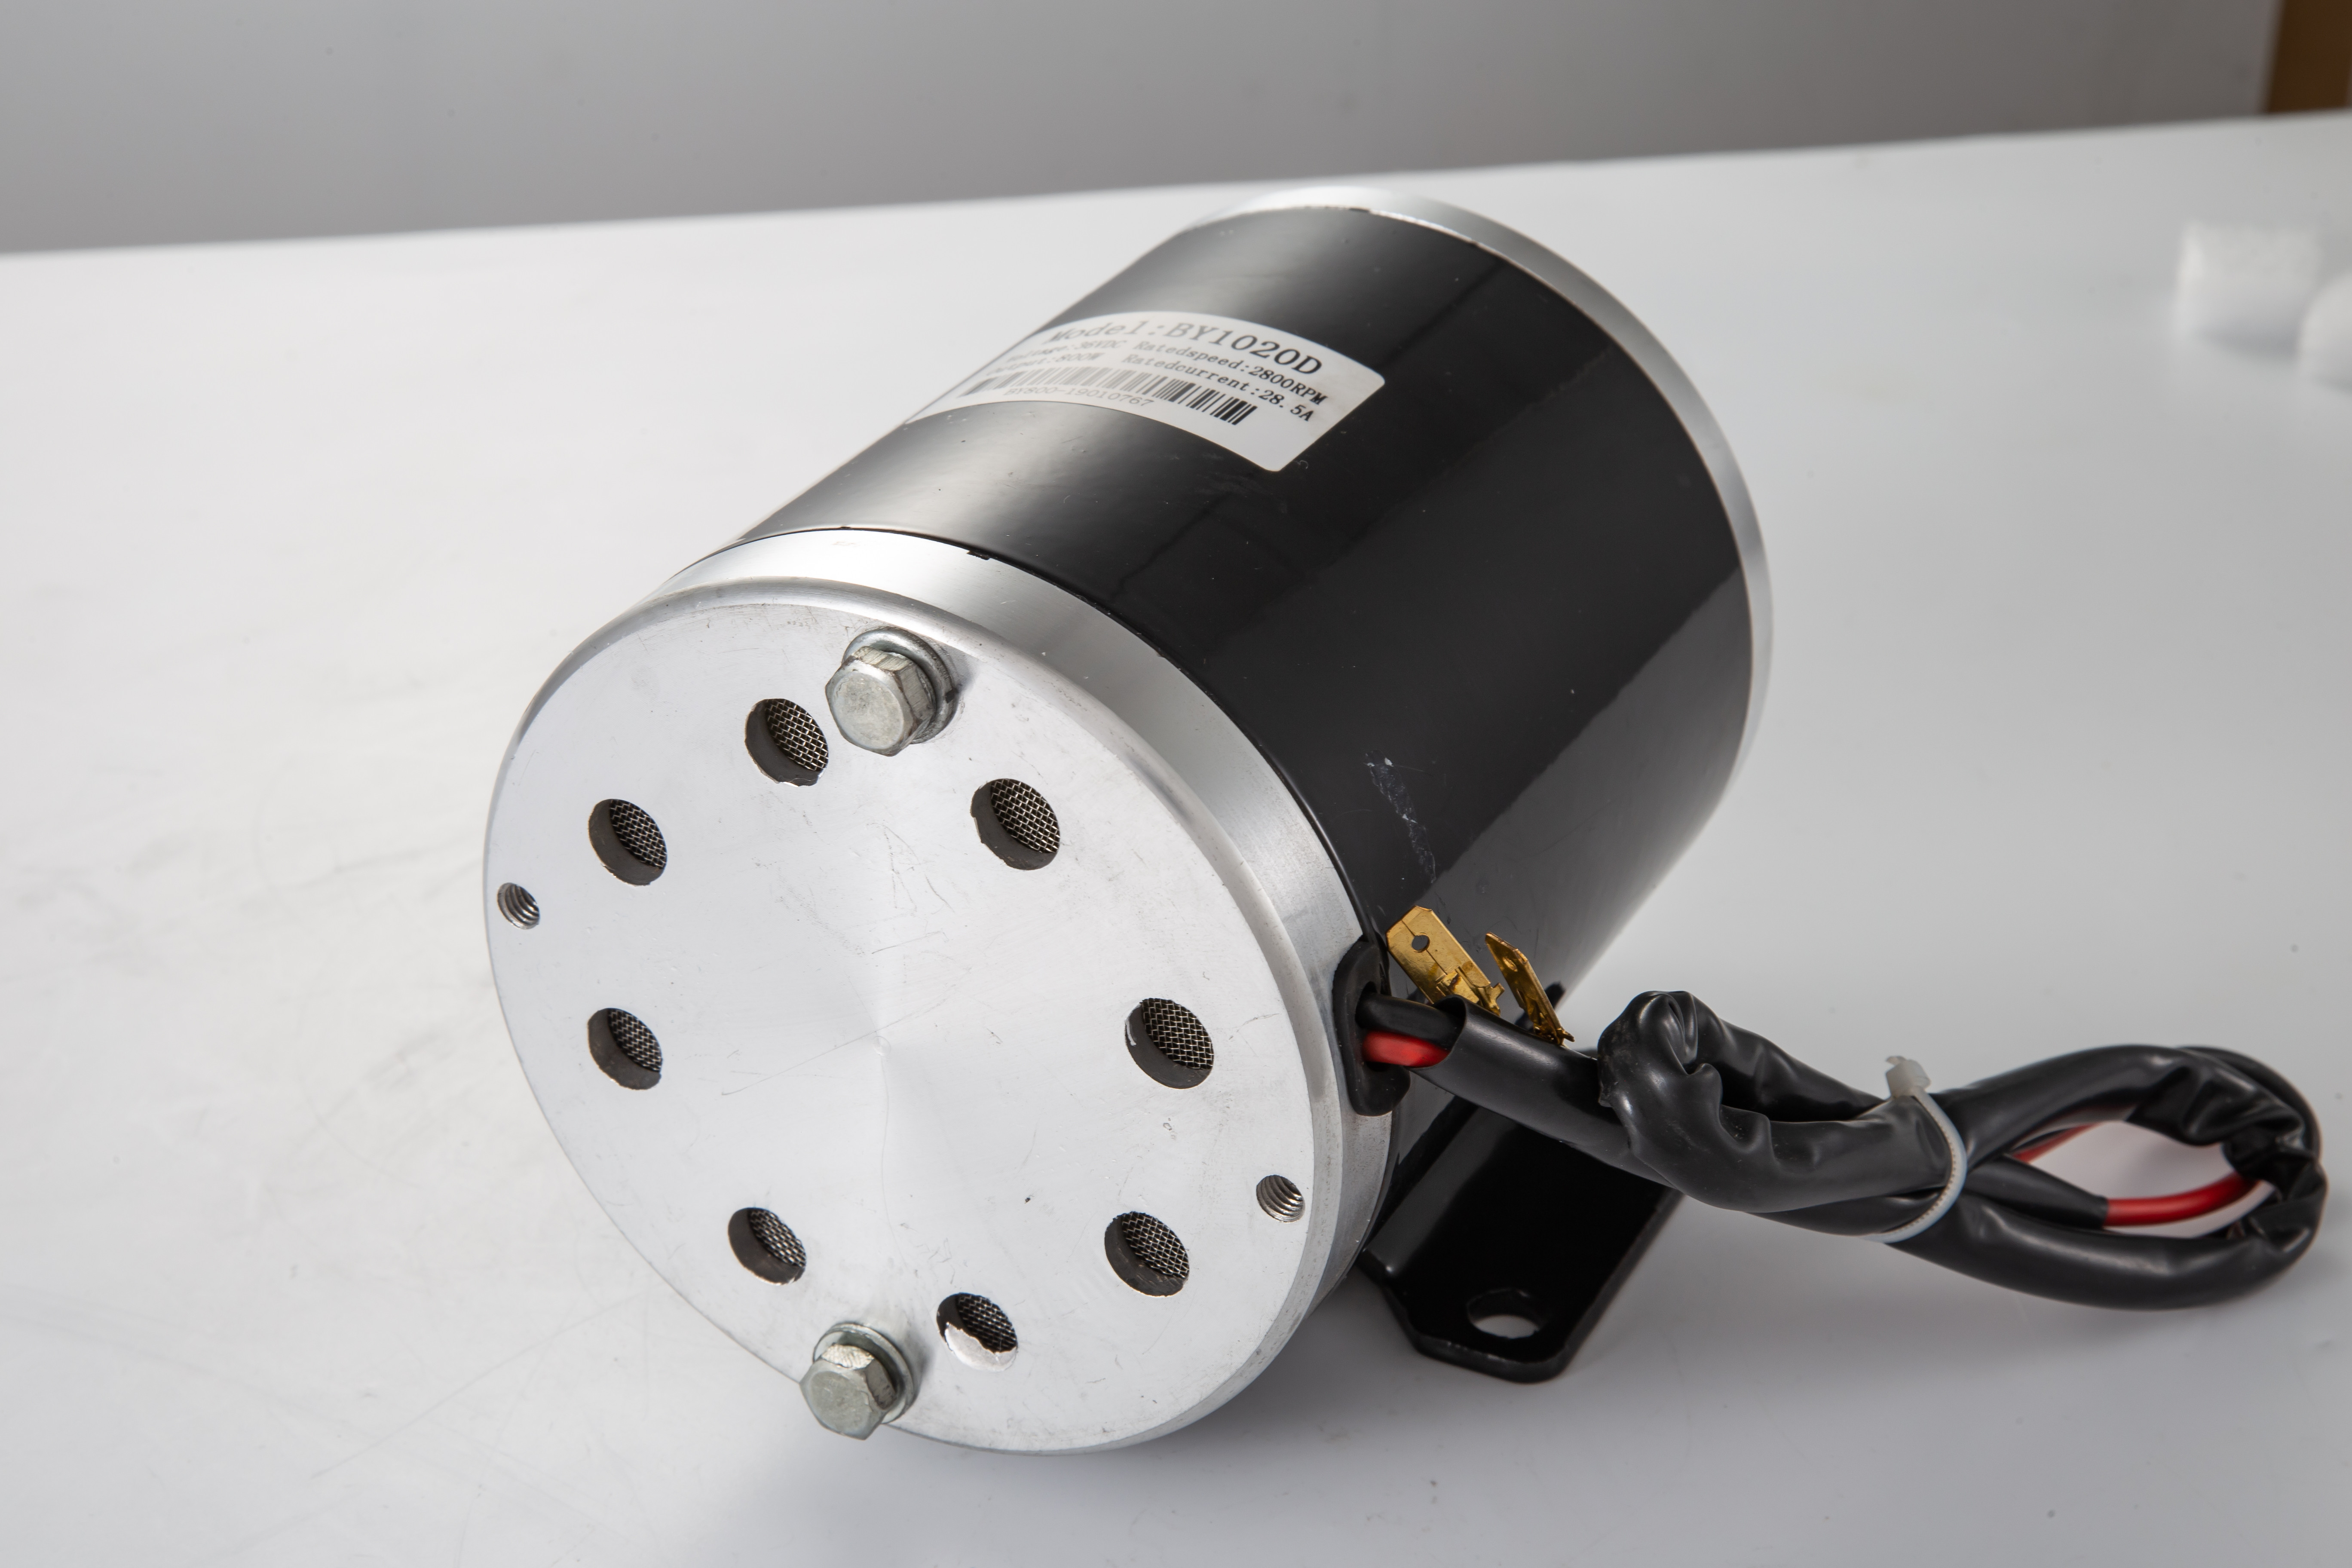 36v-Electric-Motor-controller-throttle-kit-f-Scooter-E-Scooter-ATV-Permanent thumbnail 116